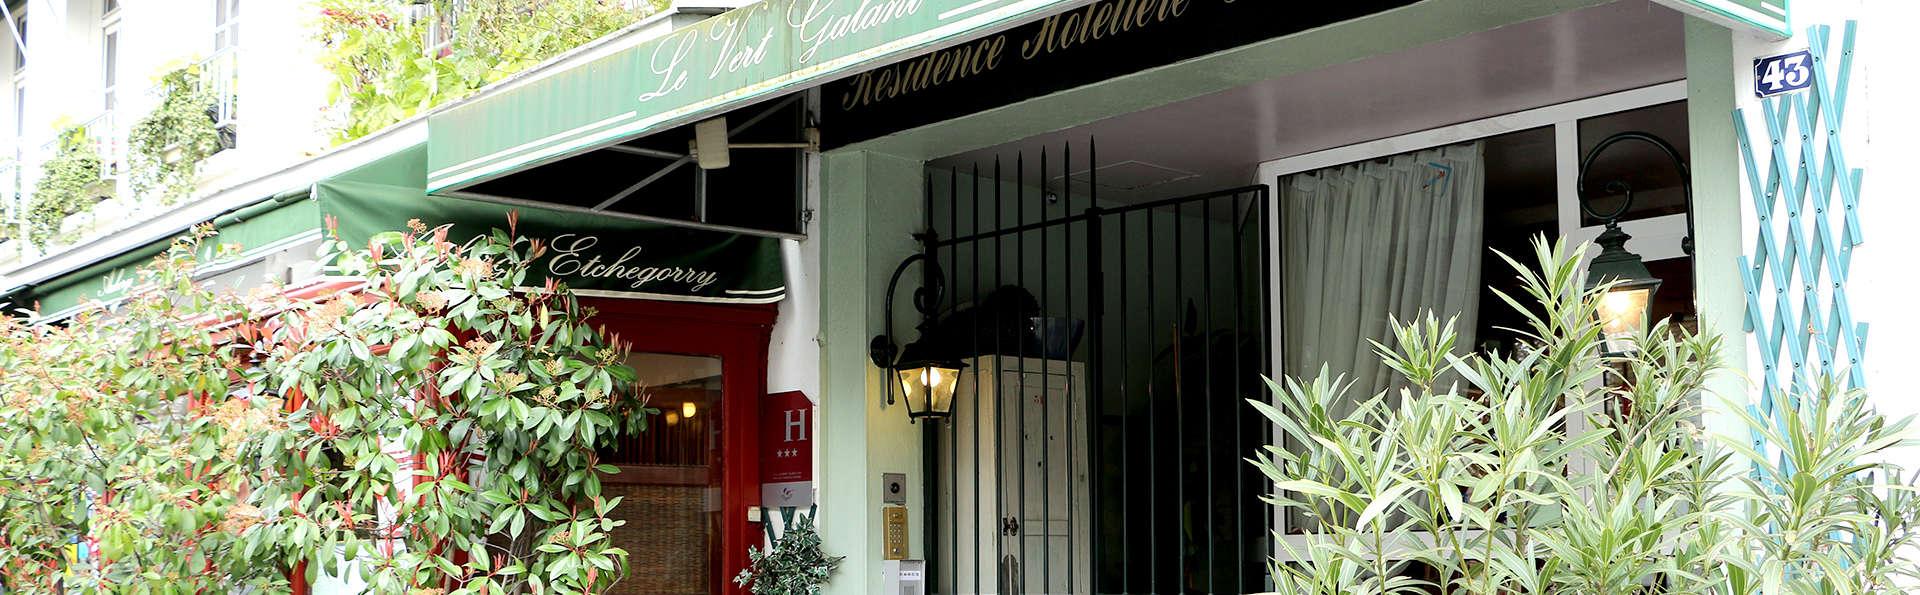 Hotel - Restaurant Le Vert Galant - Edit_Front3.jpg